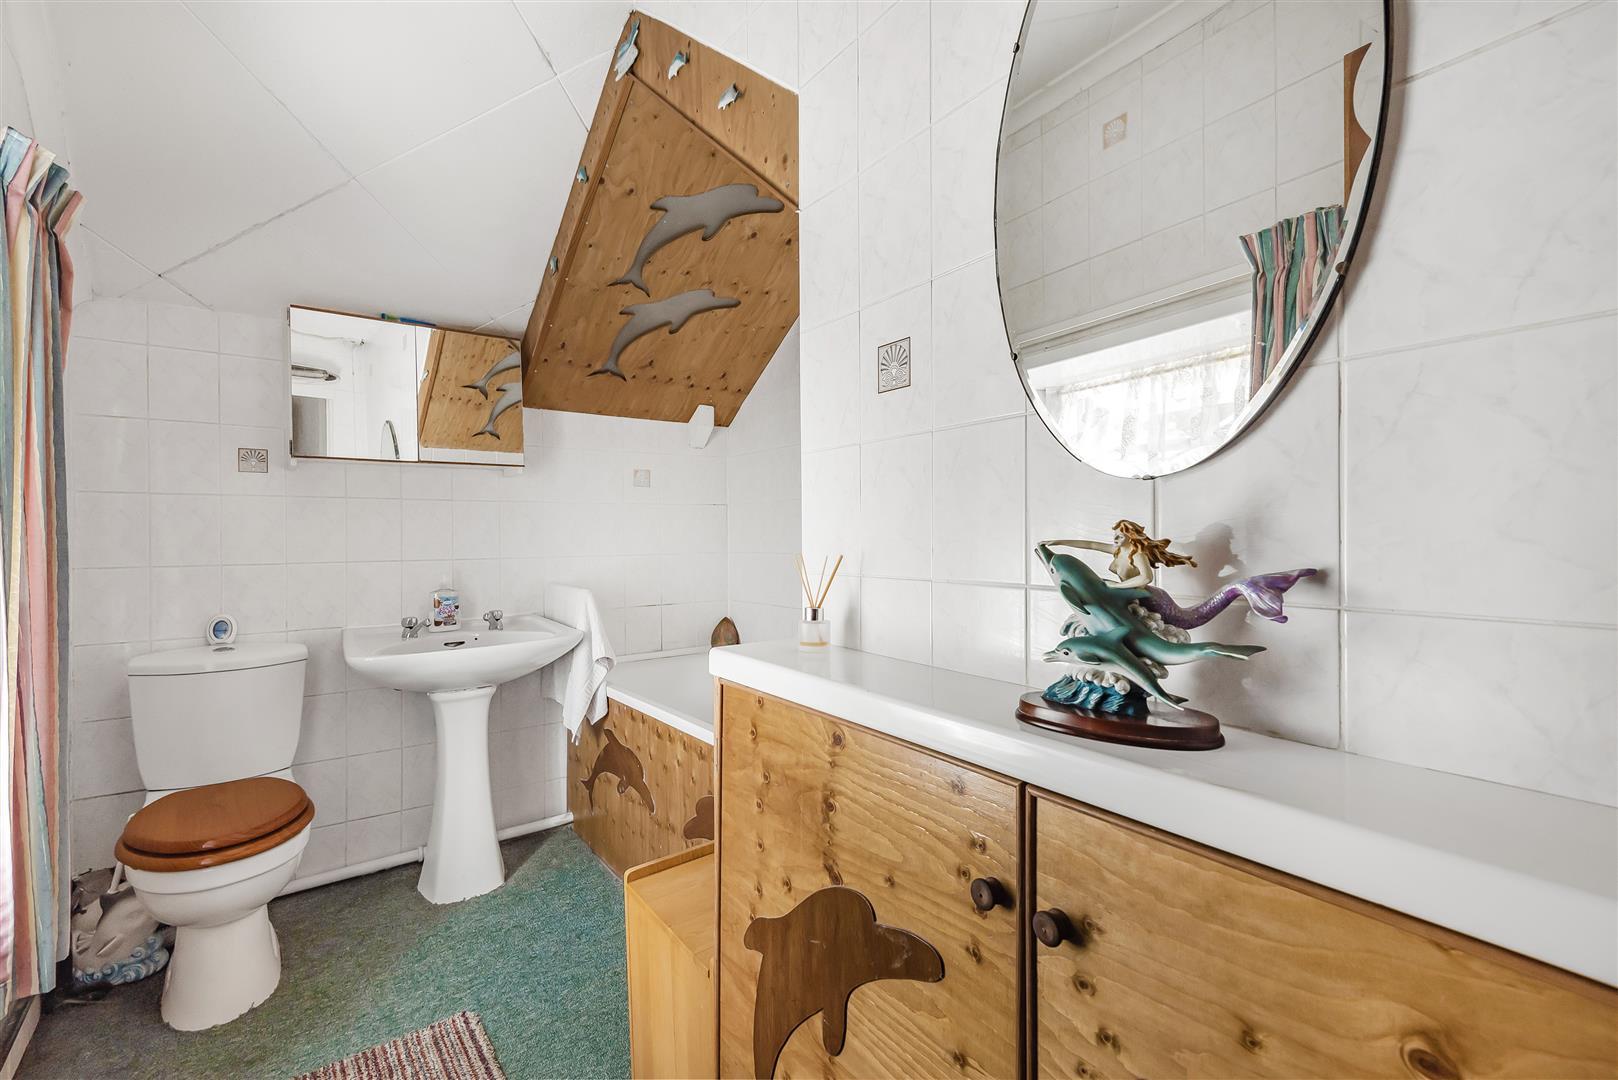 Melin Llan Cottage, Penllergaer, Swansea, SA4 9GU